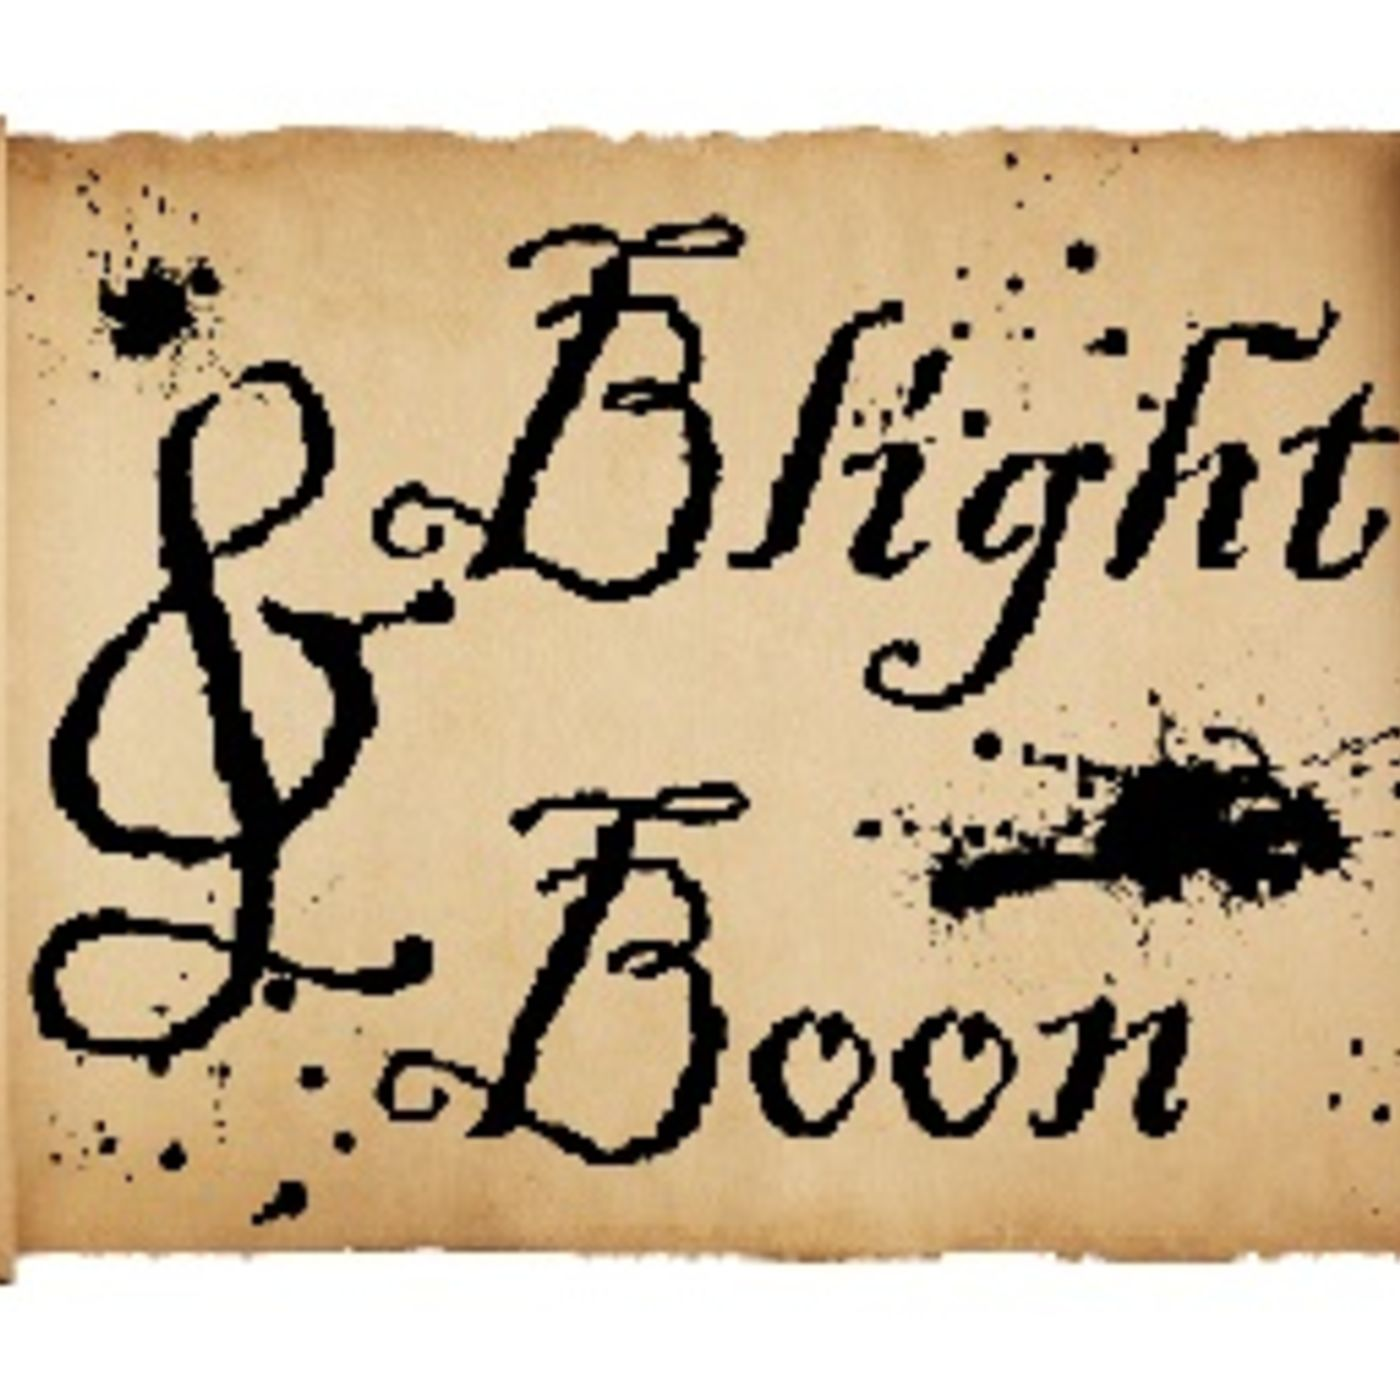 Blight and Boon - A Godtear Podcast - Episode 14 - Scenario Focus - Death